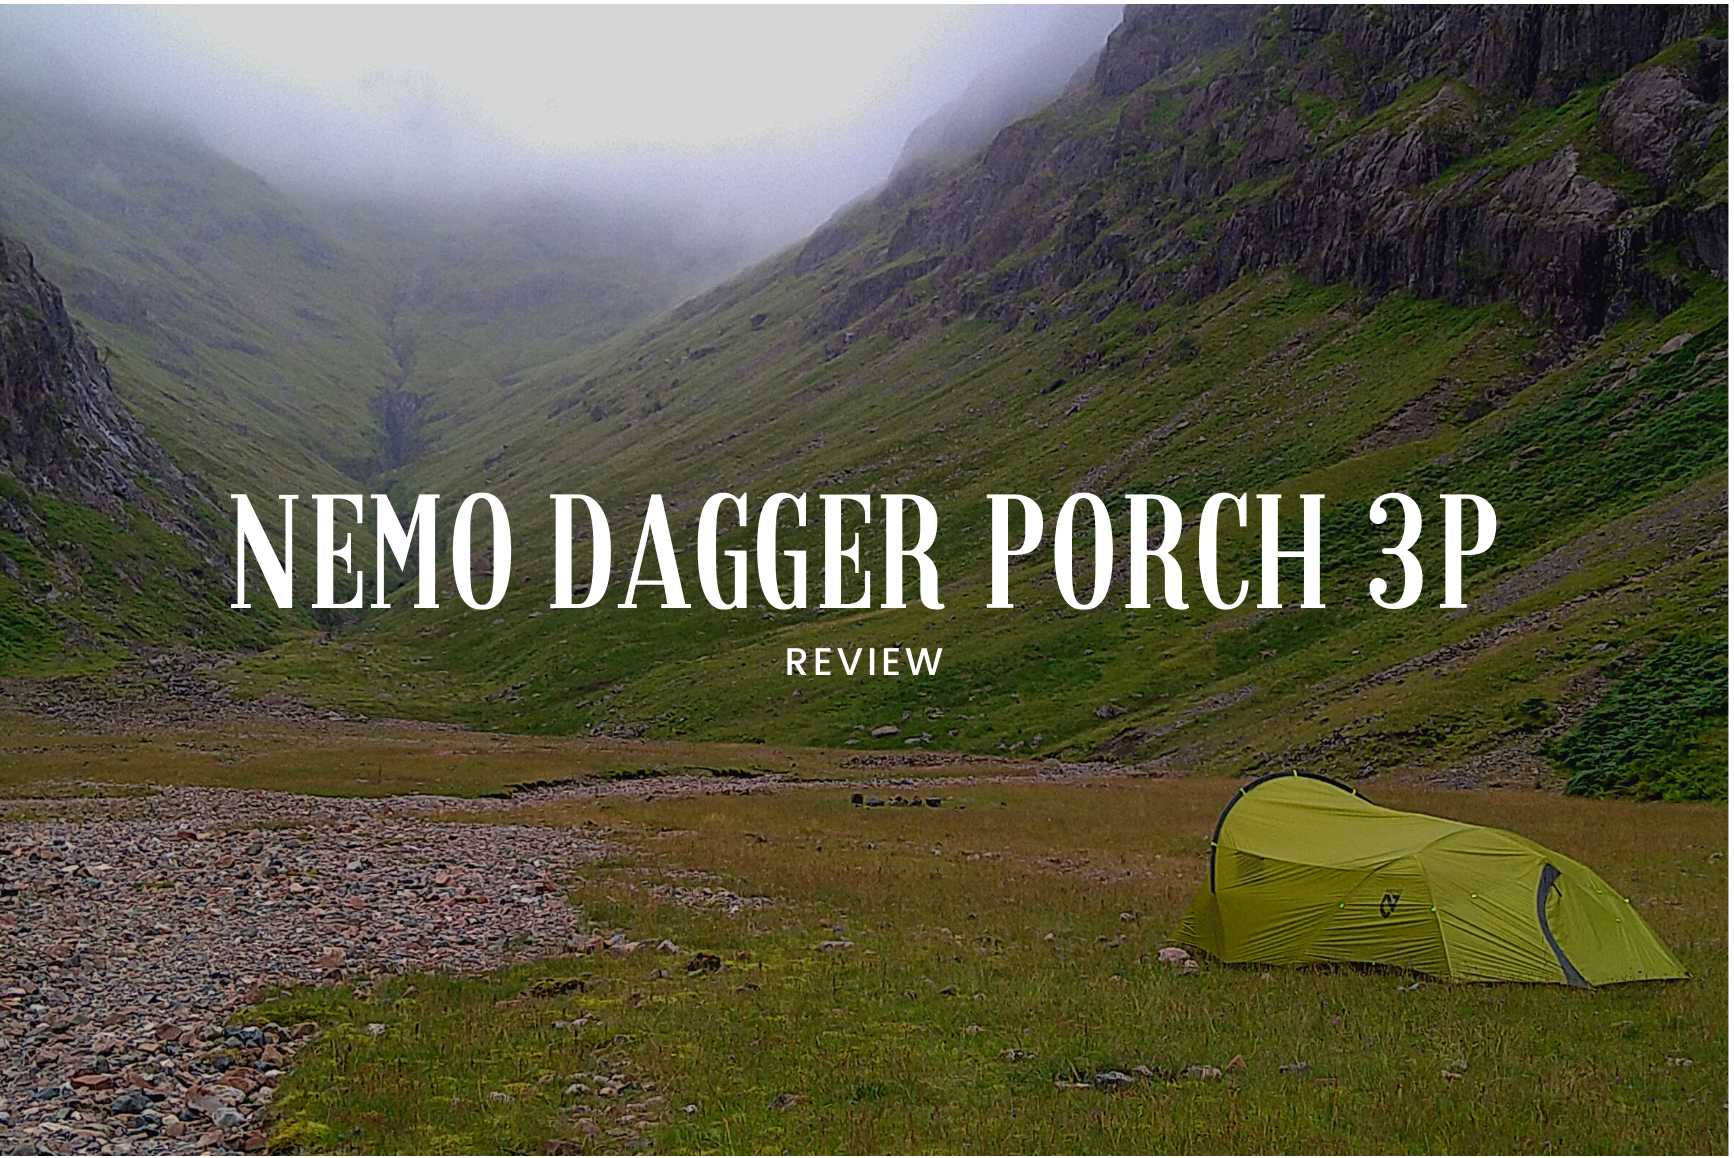 NEMO Dagger Porch tent review